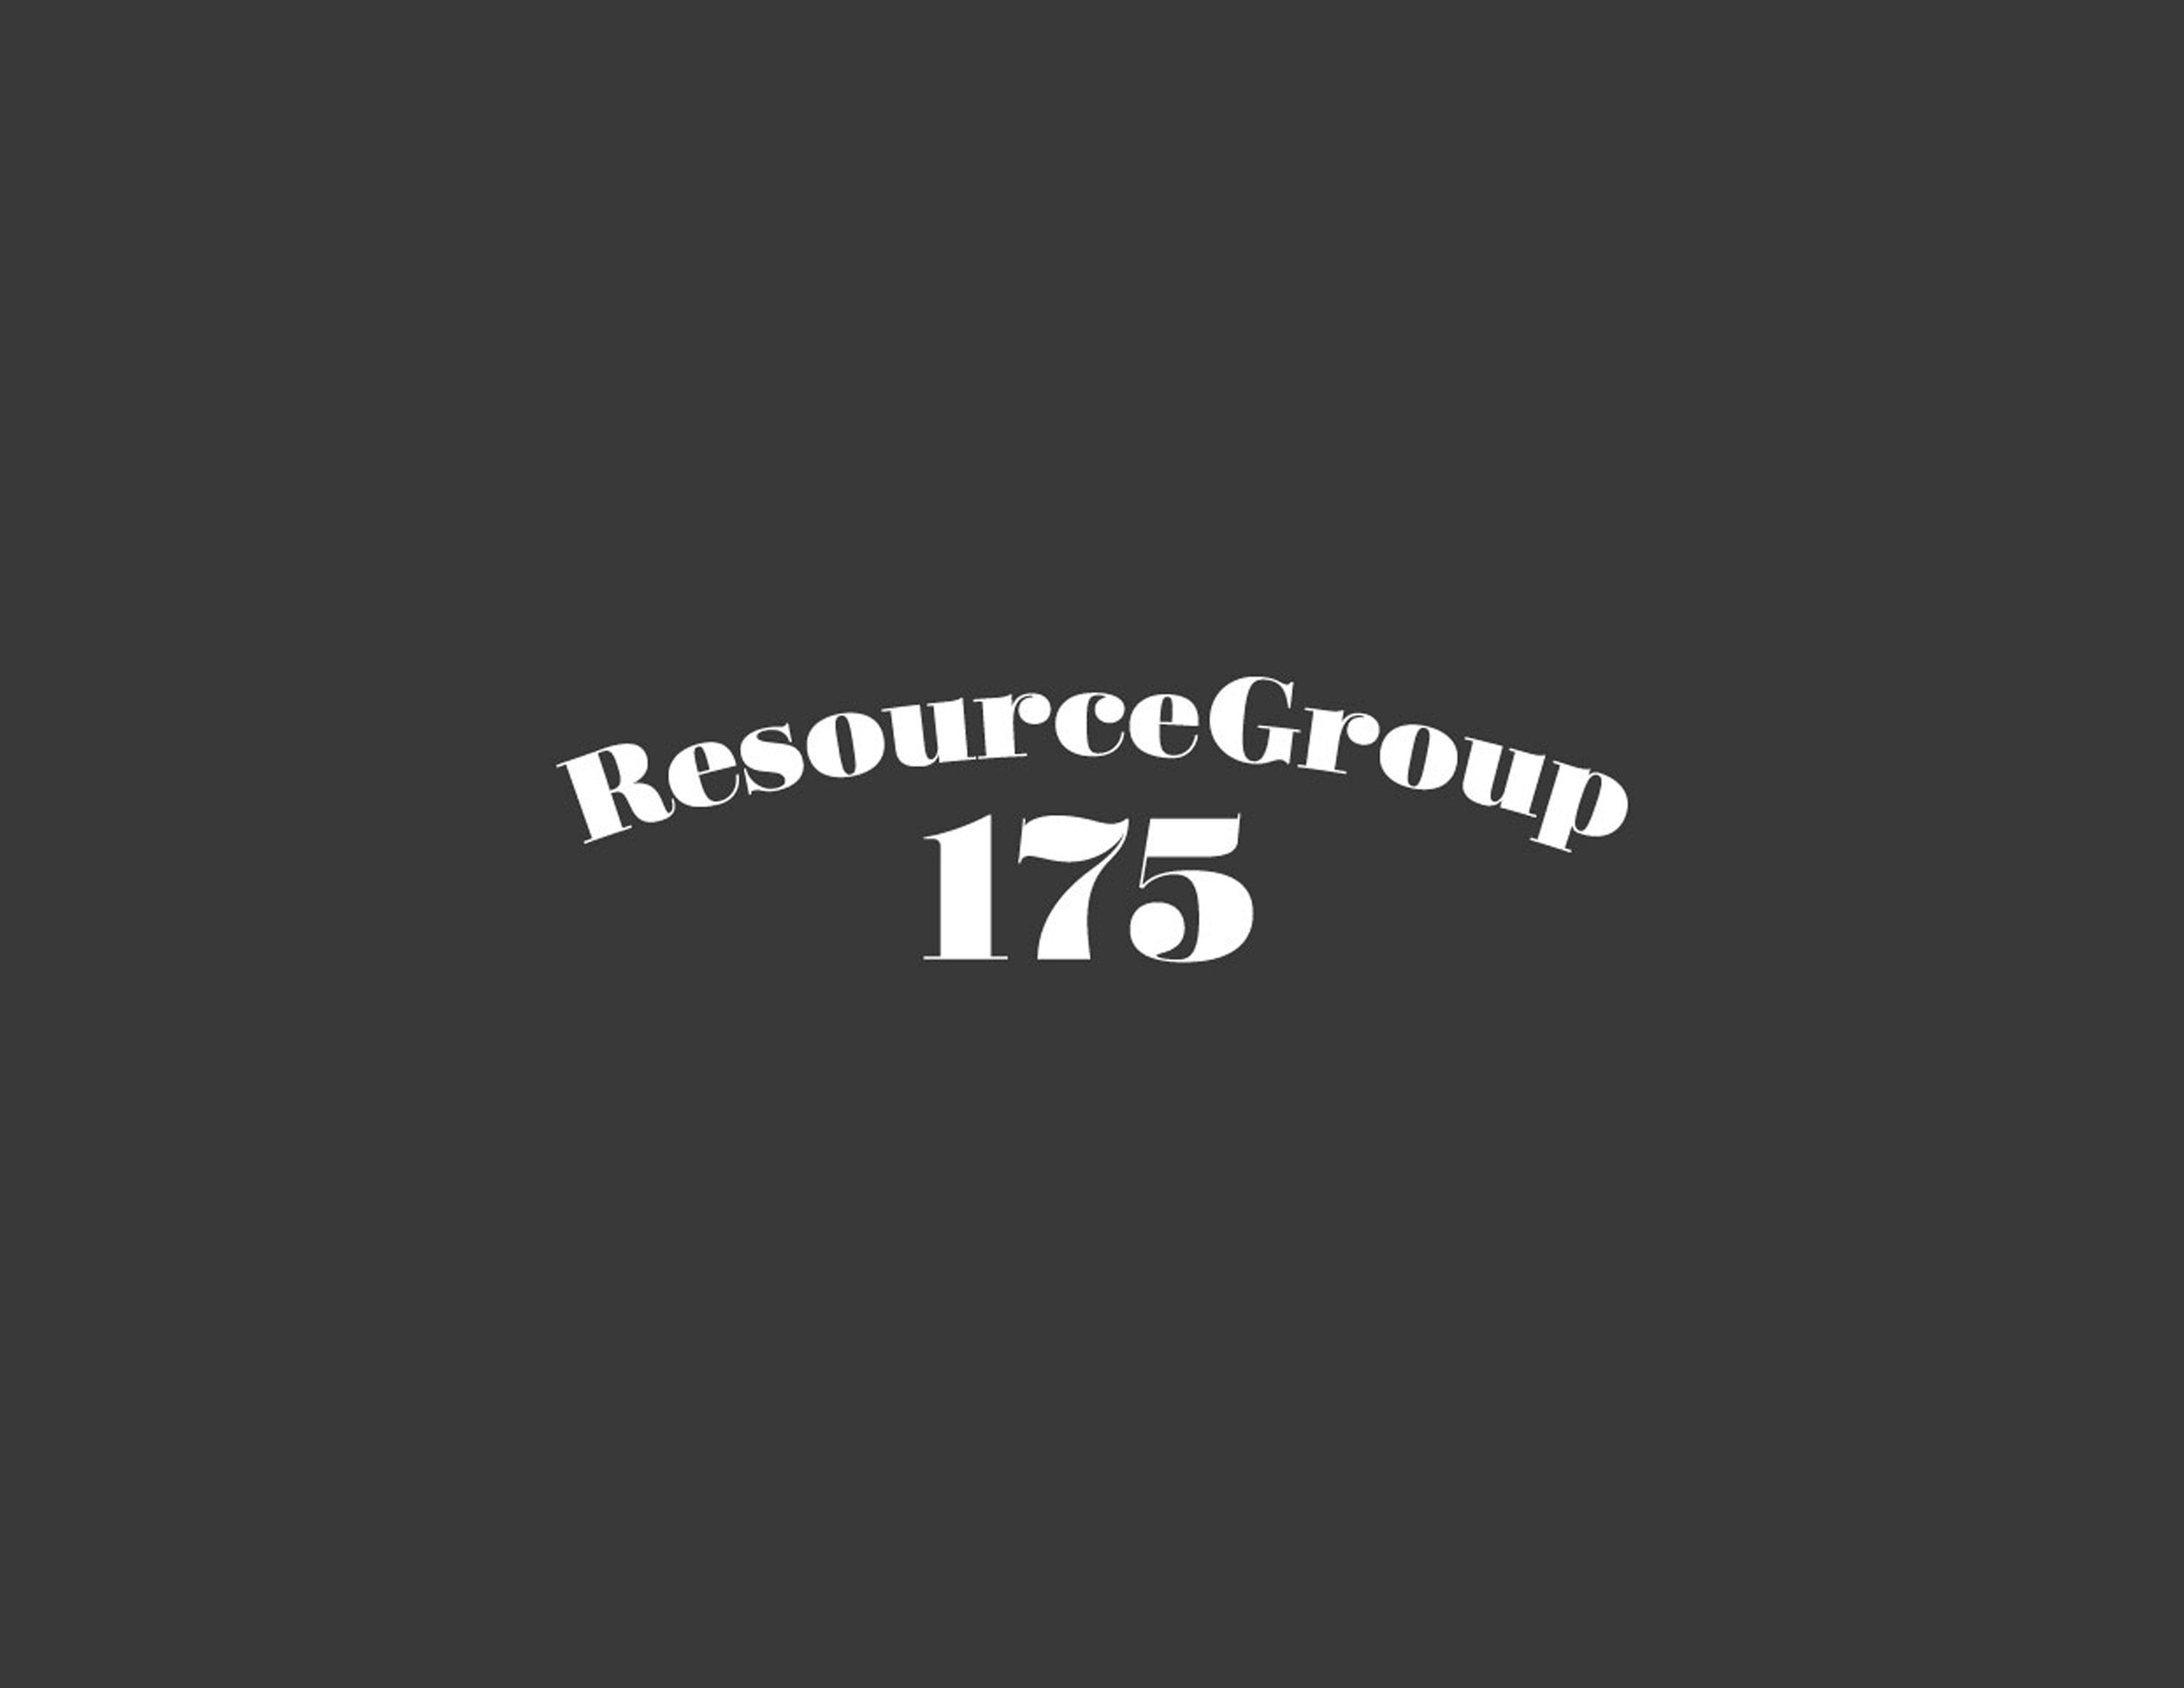 RG175.jpg